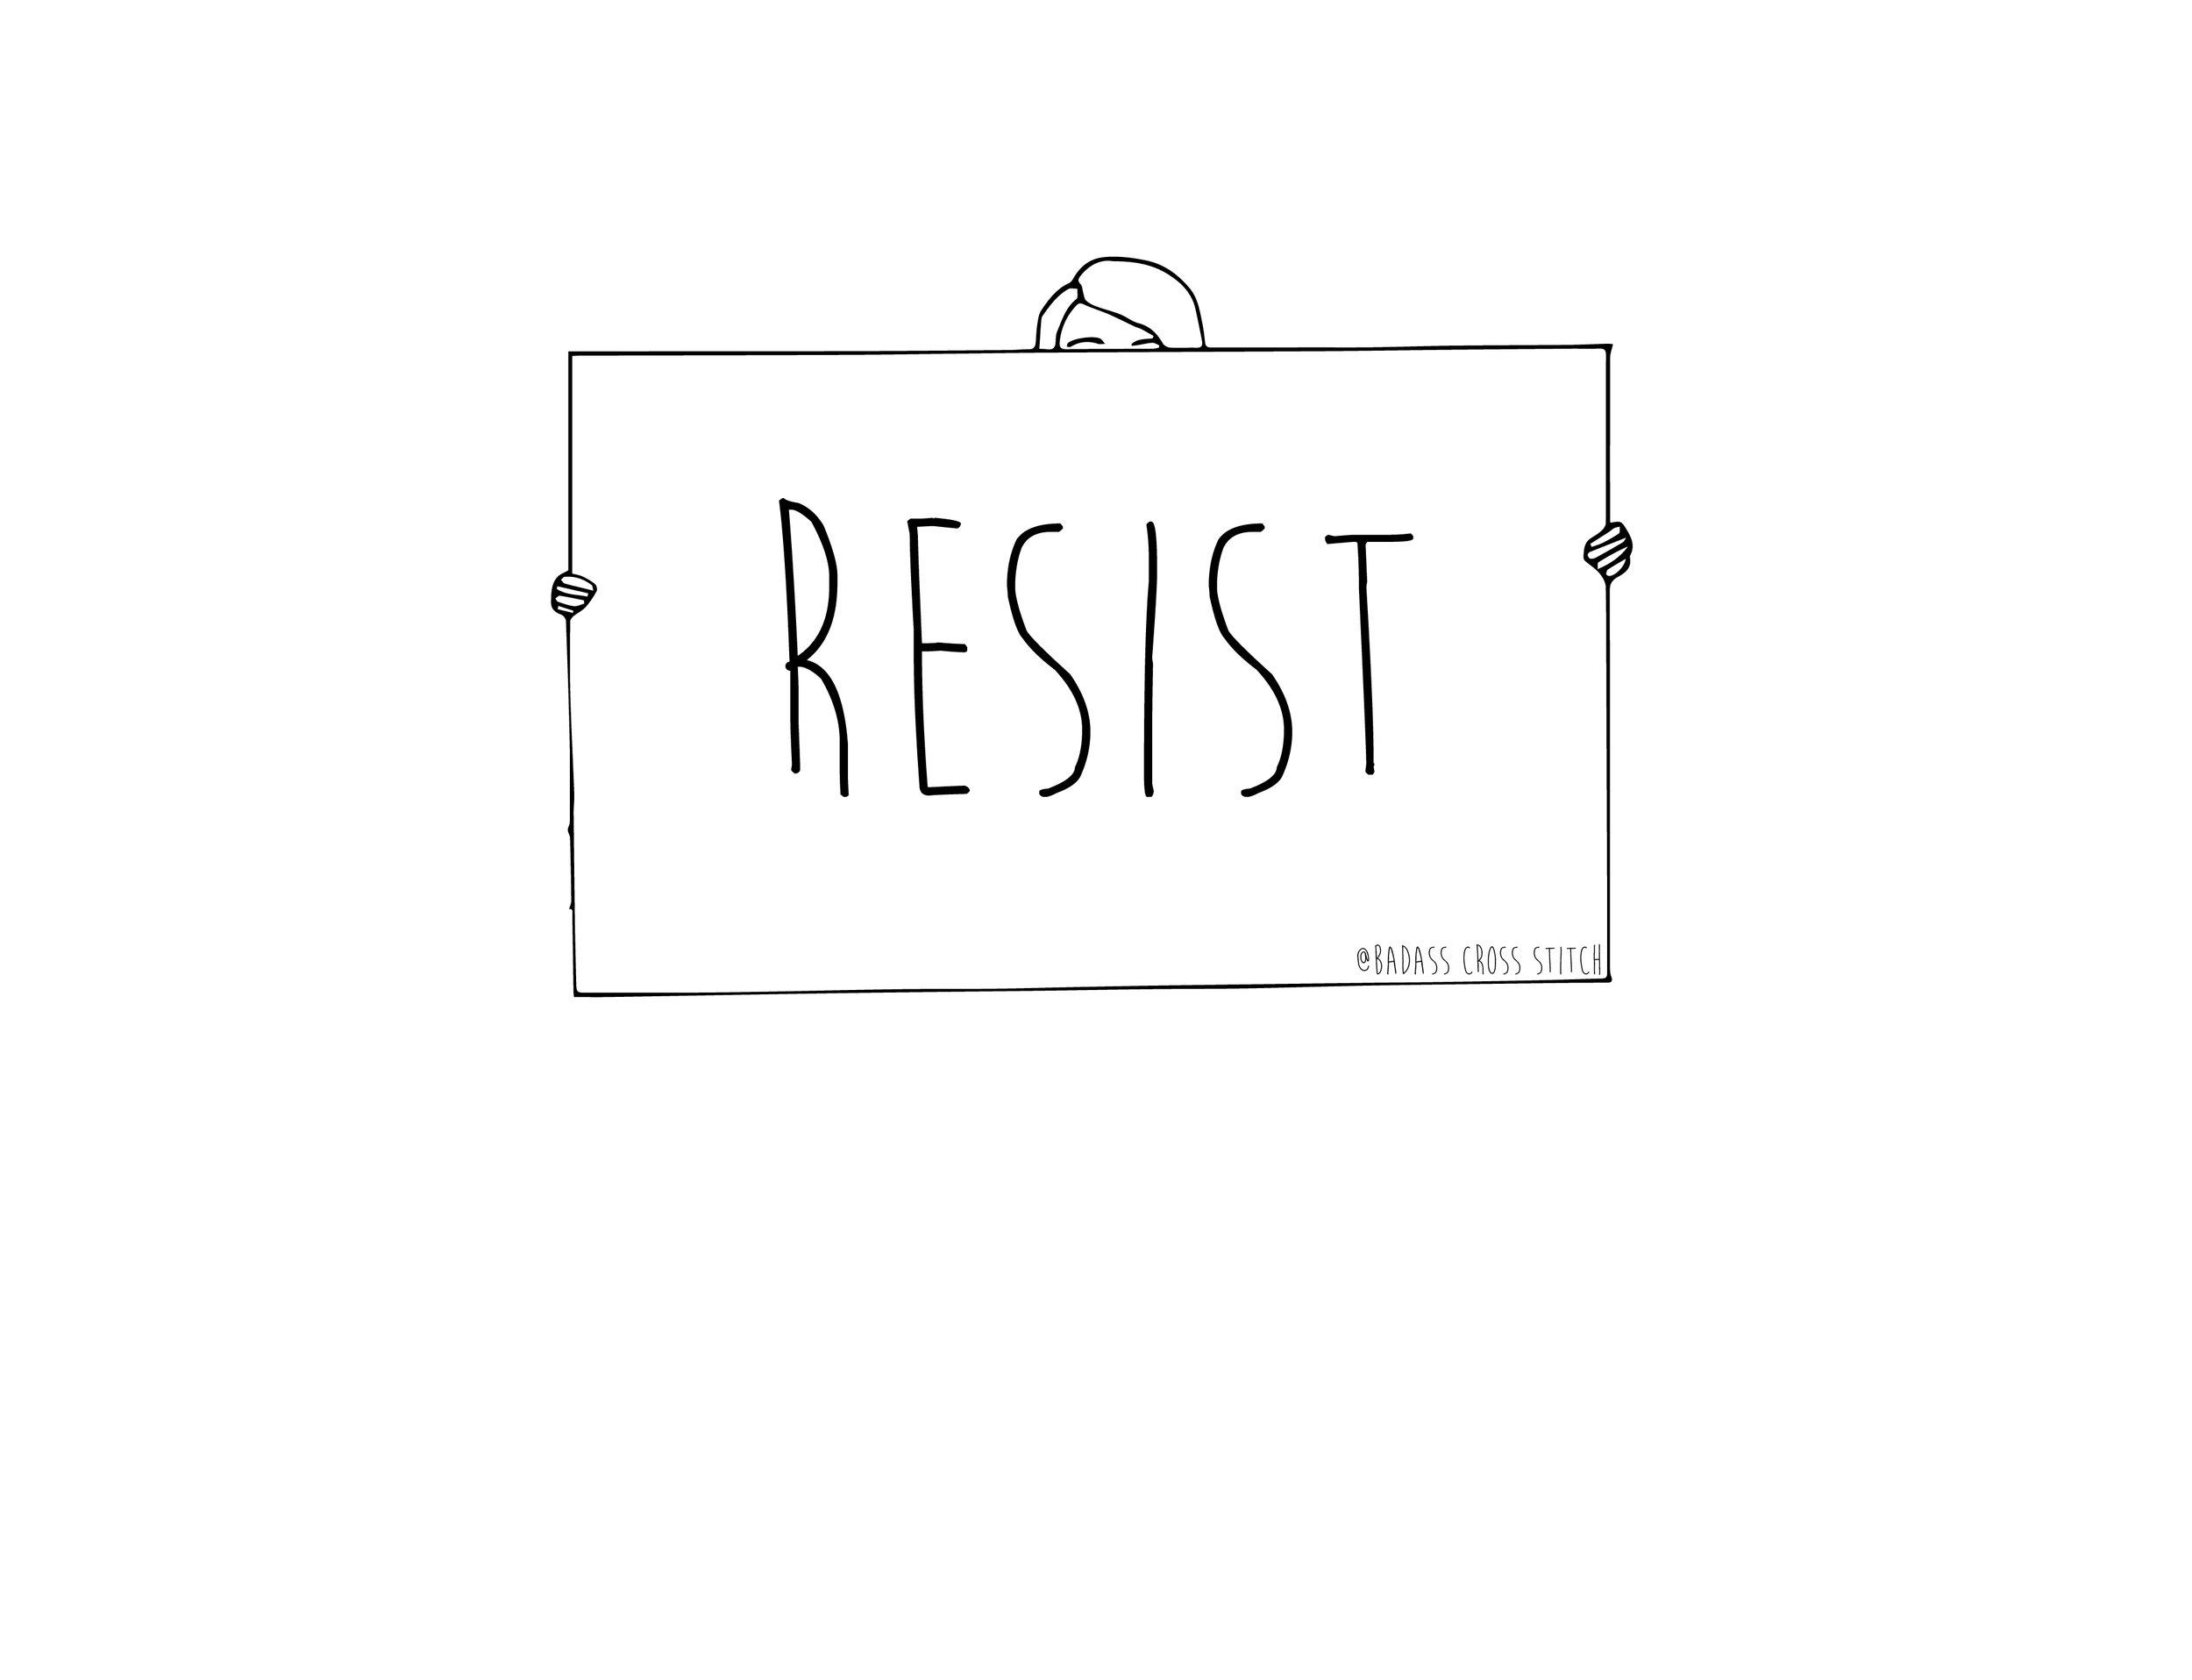 TinyShannon-resist.jpg